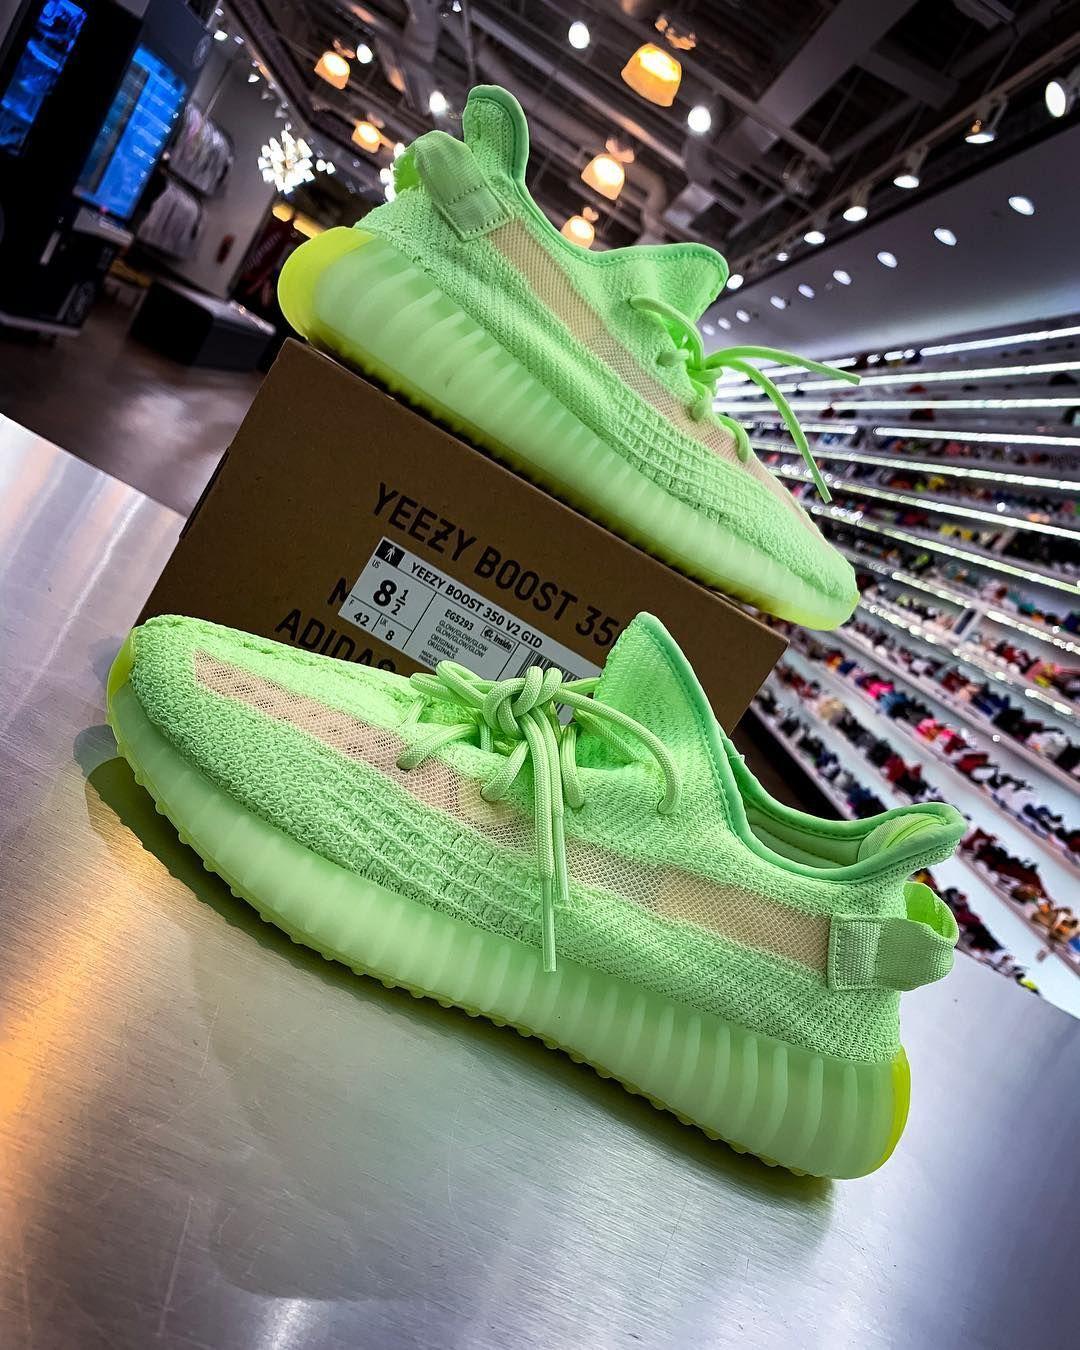 fashion shoes, Adidas yeezy boost